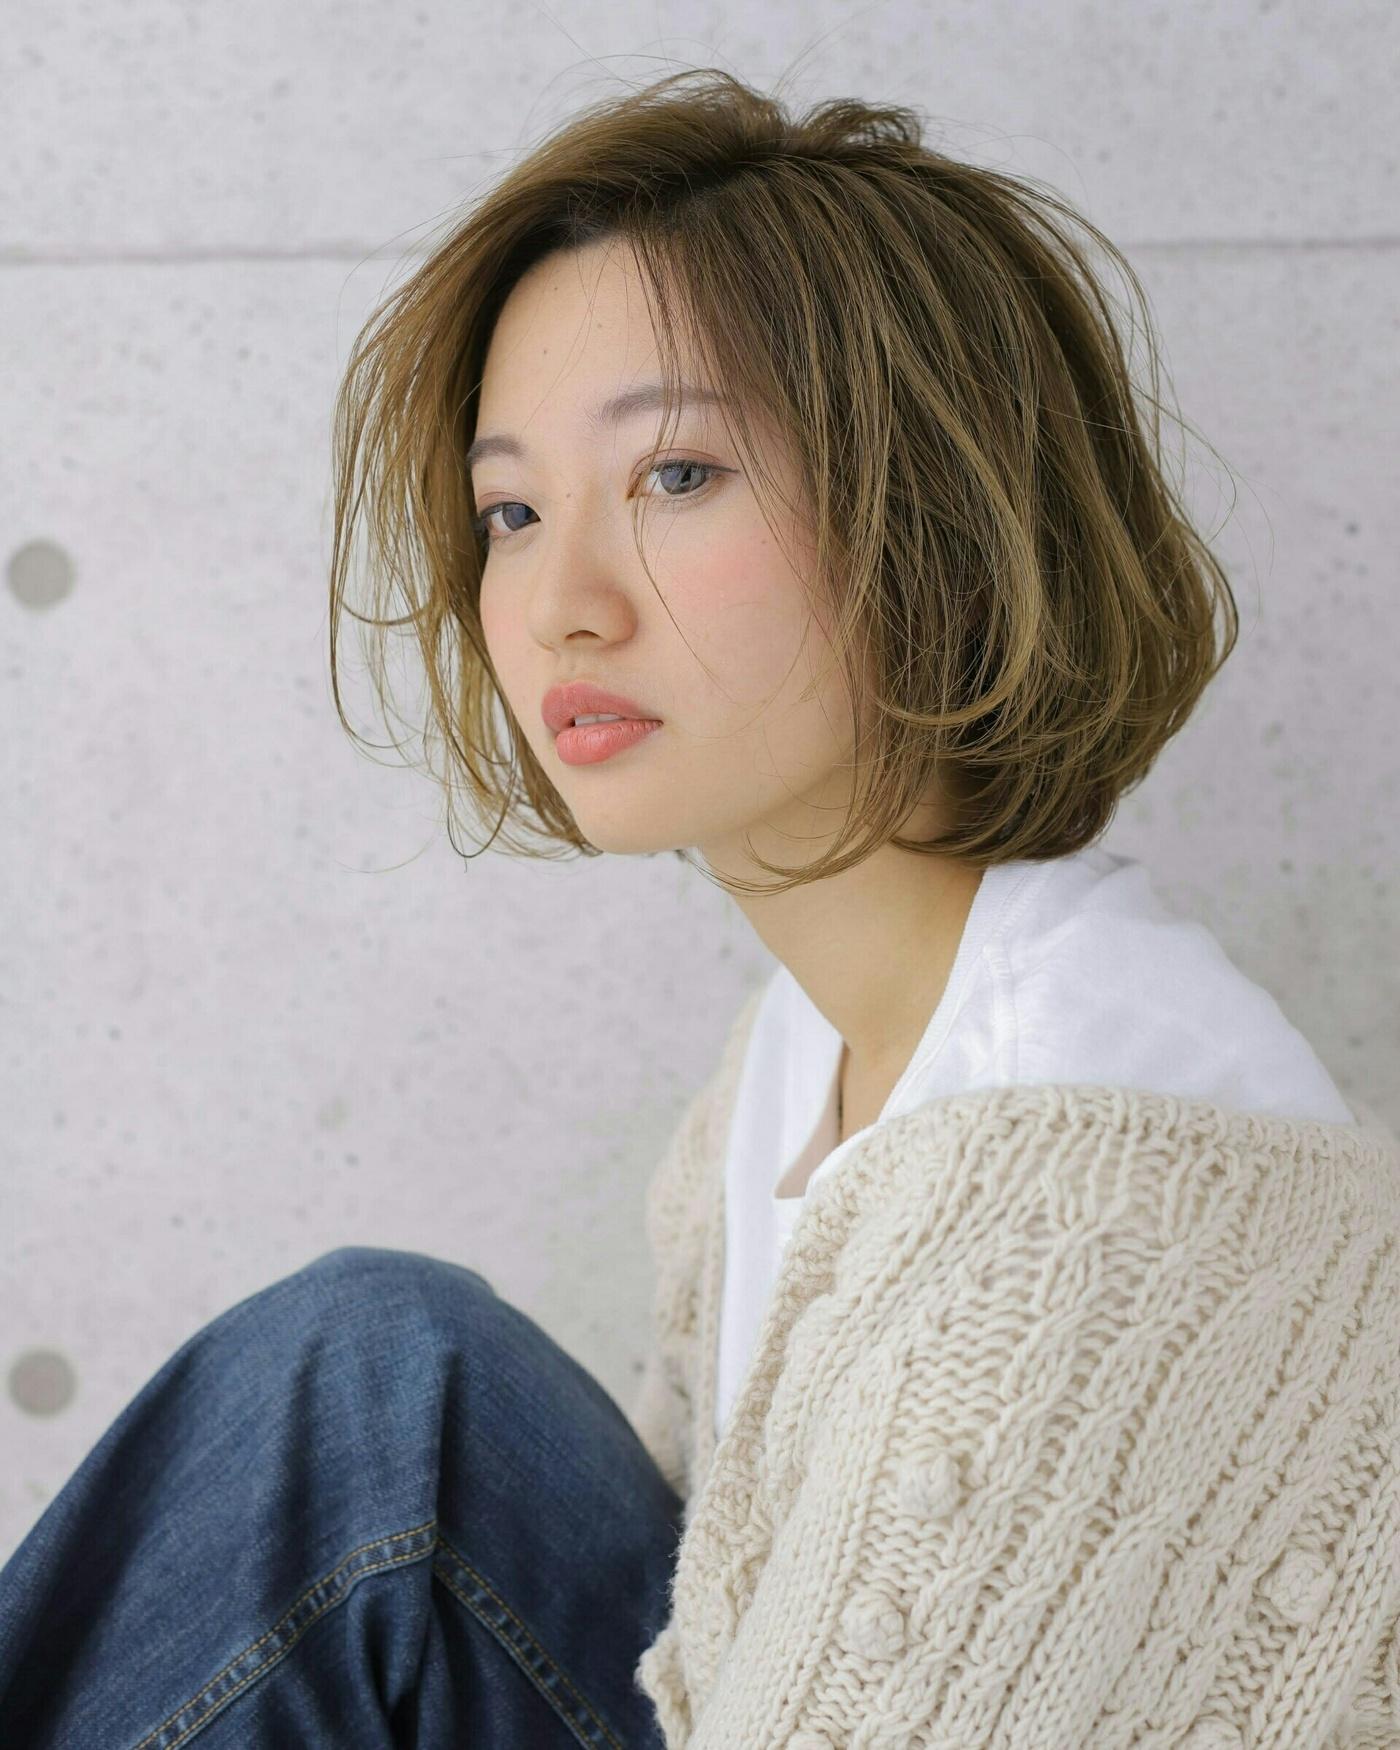 Masatoshi Yamanouchiが投稿した画像